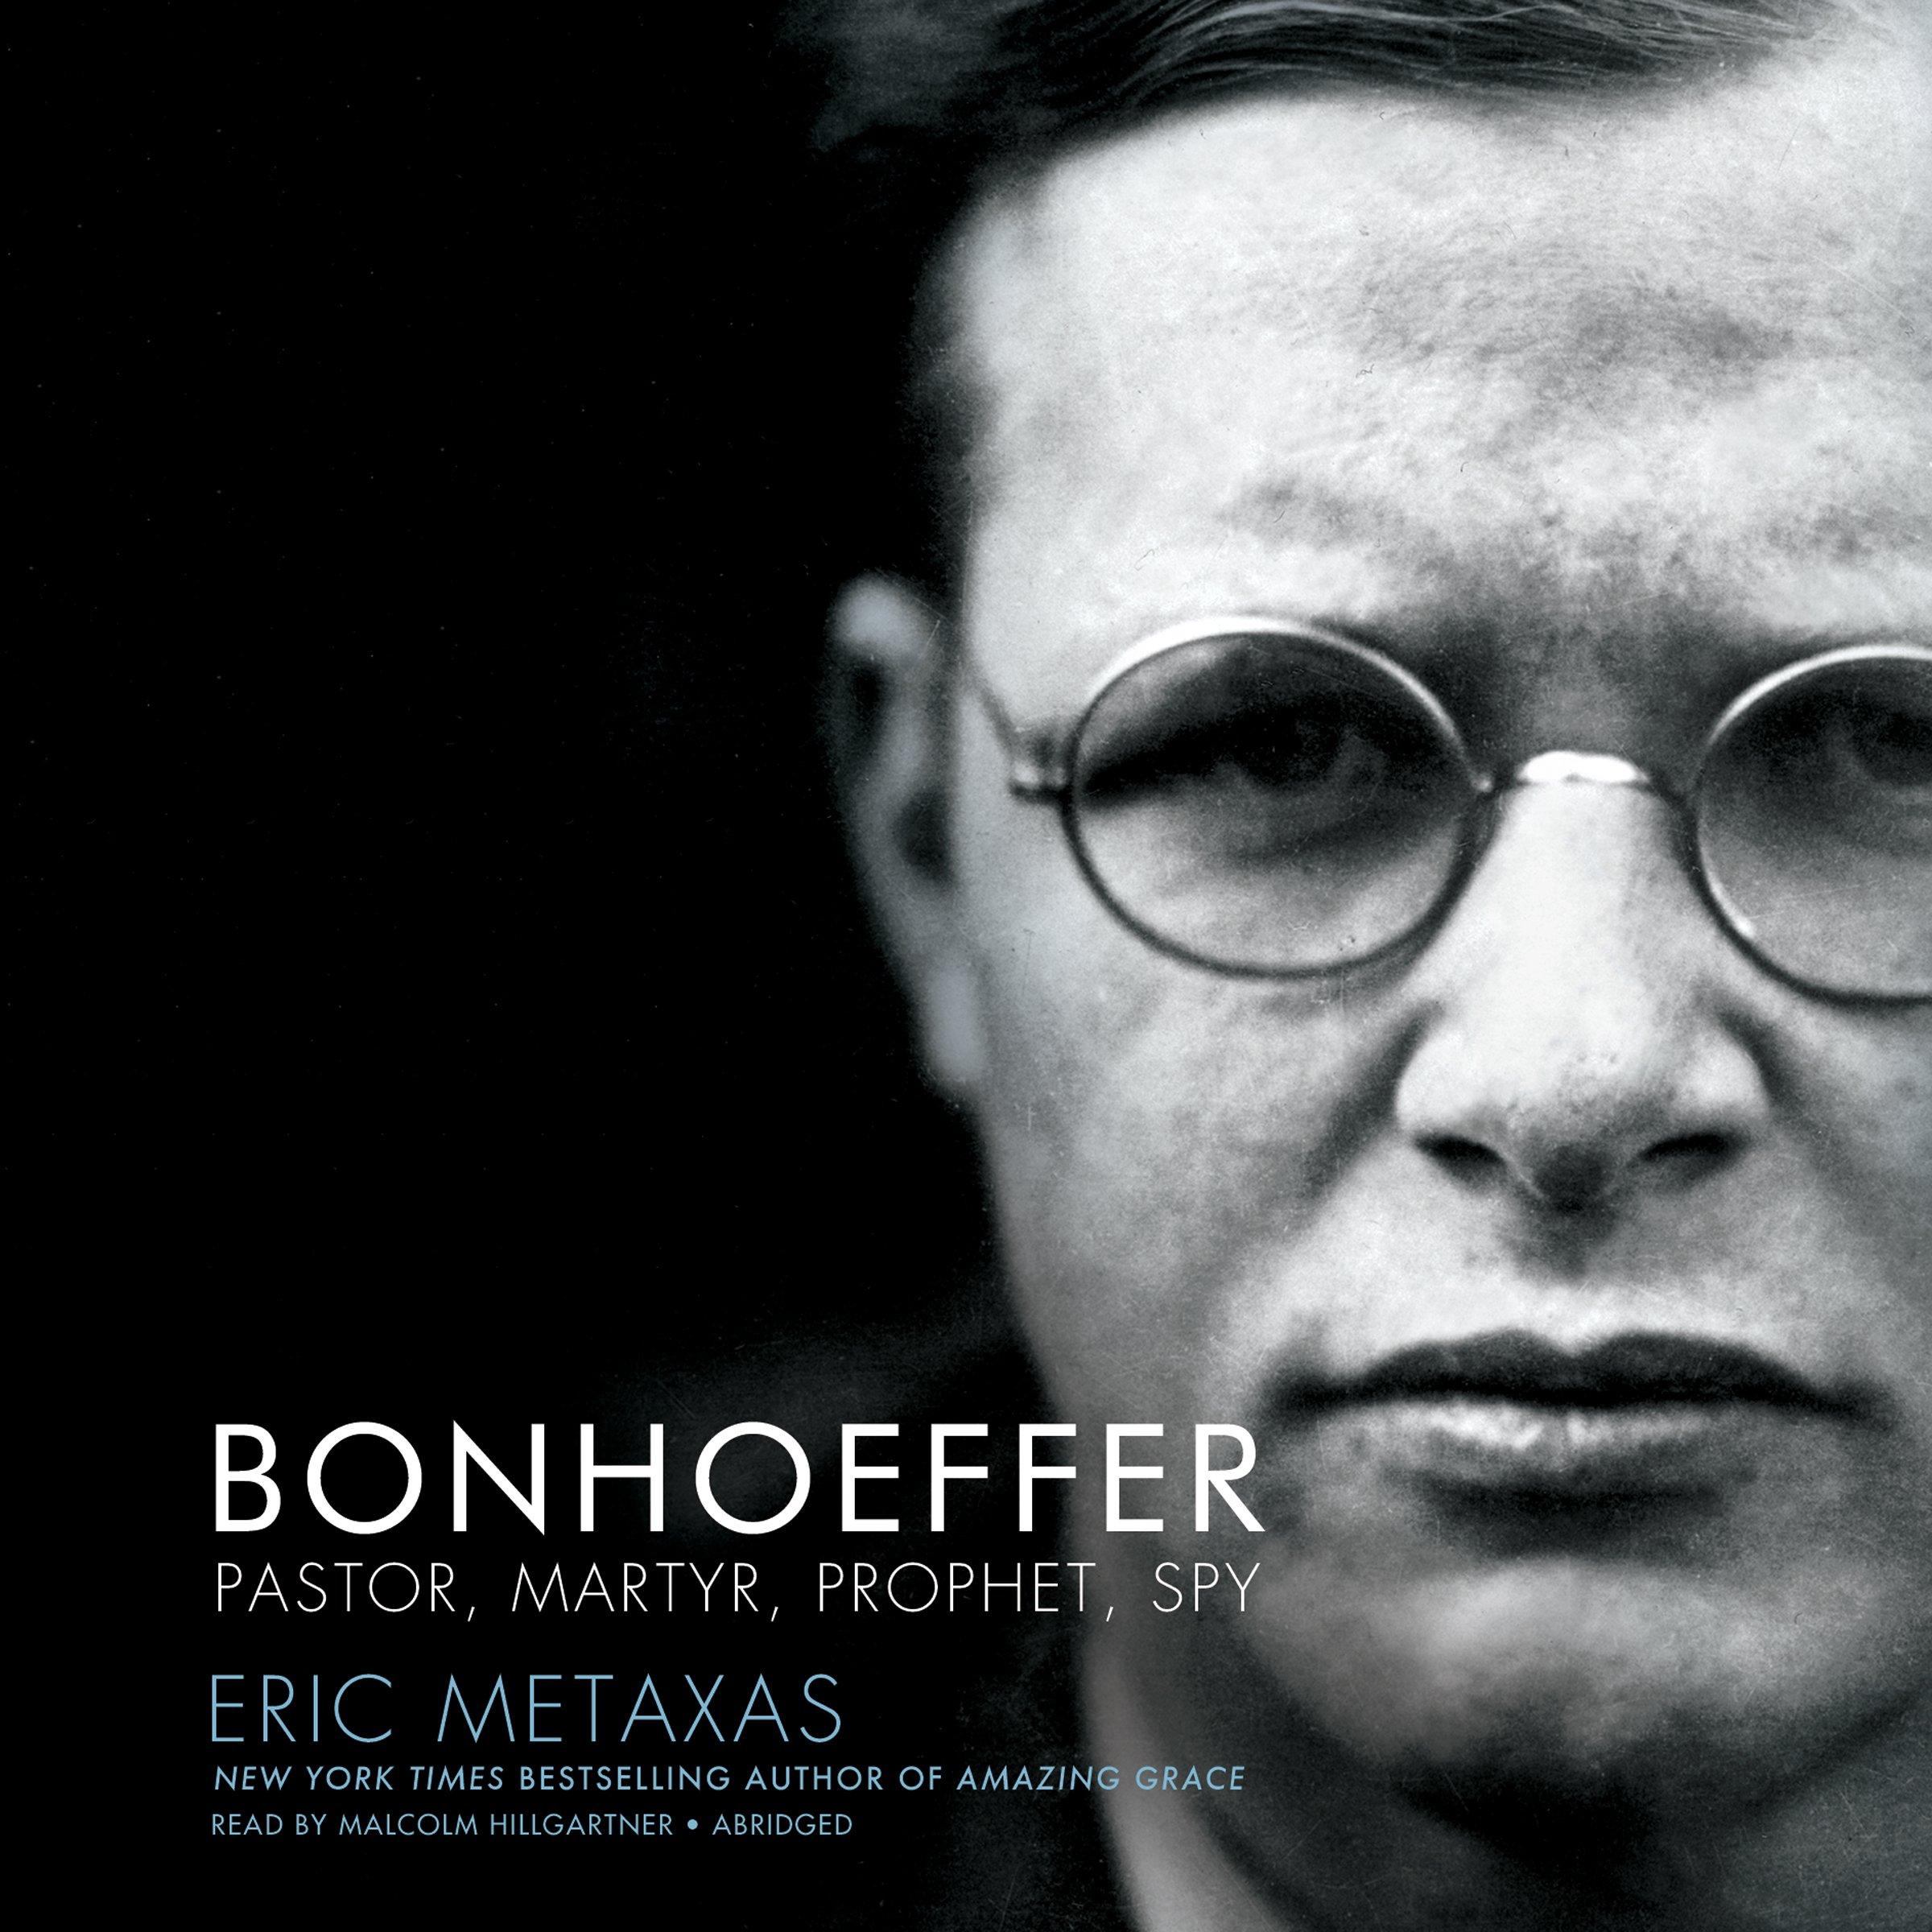 Bonhoeffer: Pastor, Martyr, Prophet, Spy; A Righteous Gentile vs. The Third Reich (ABRIDGED EDITION)